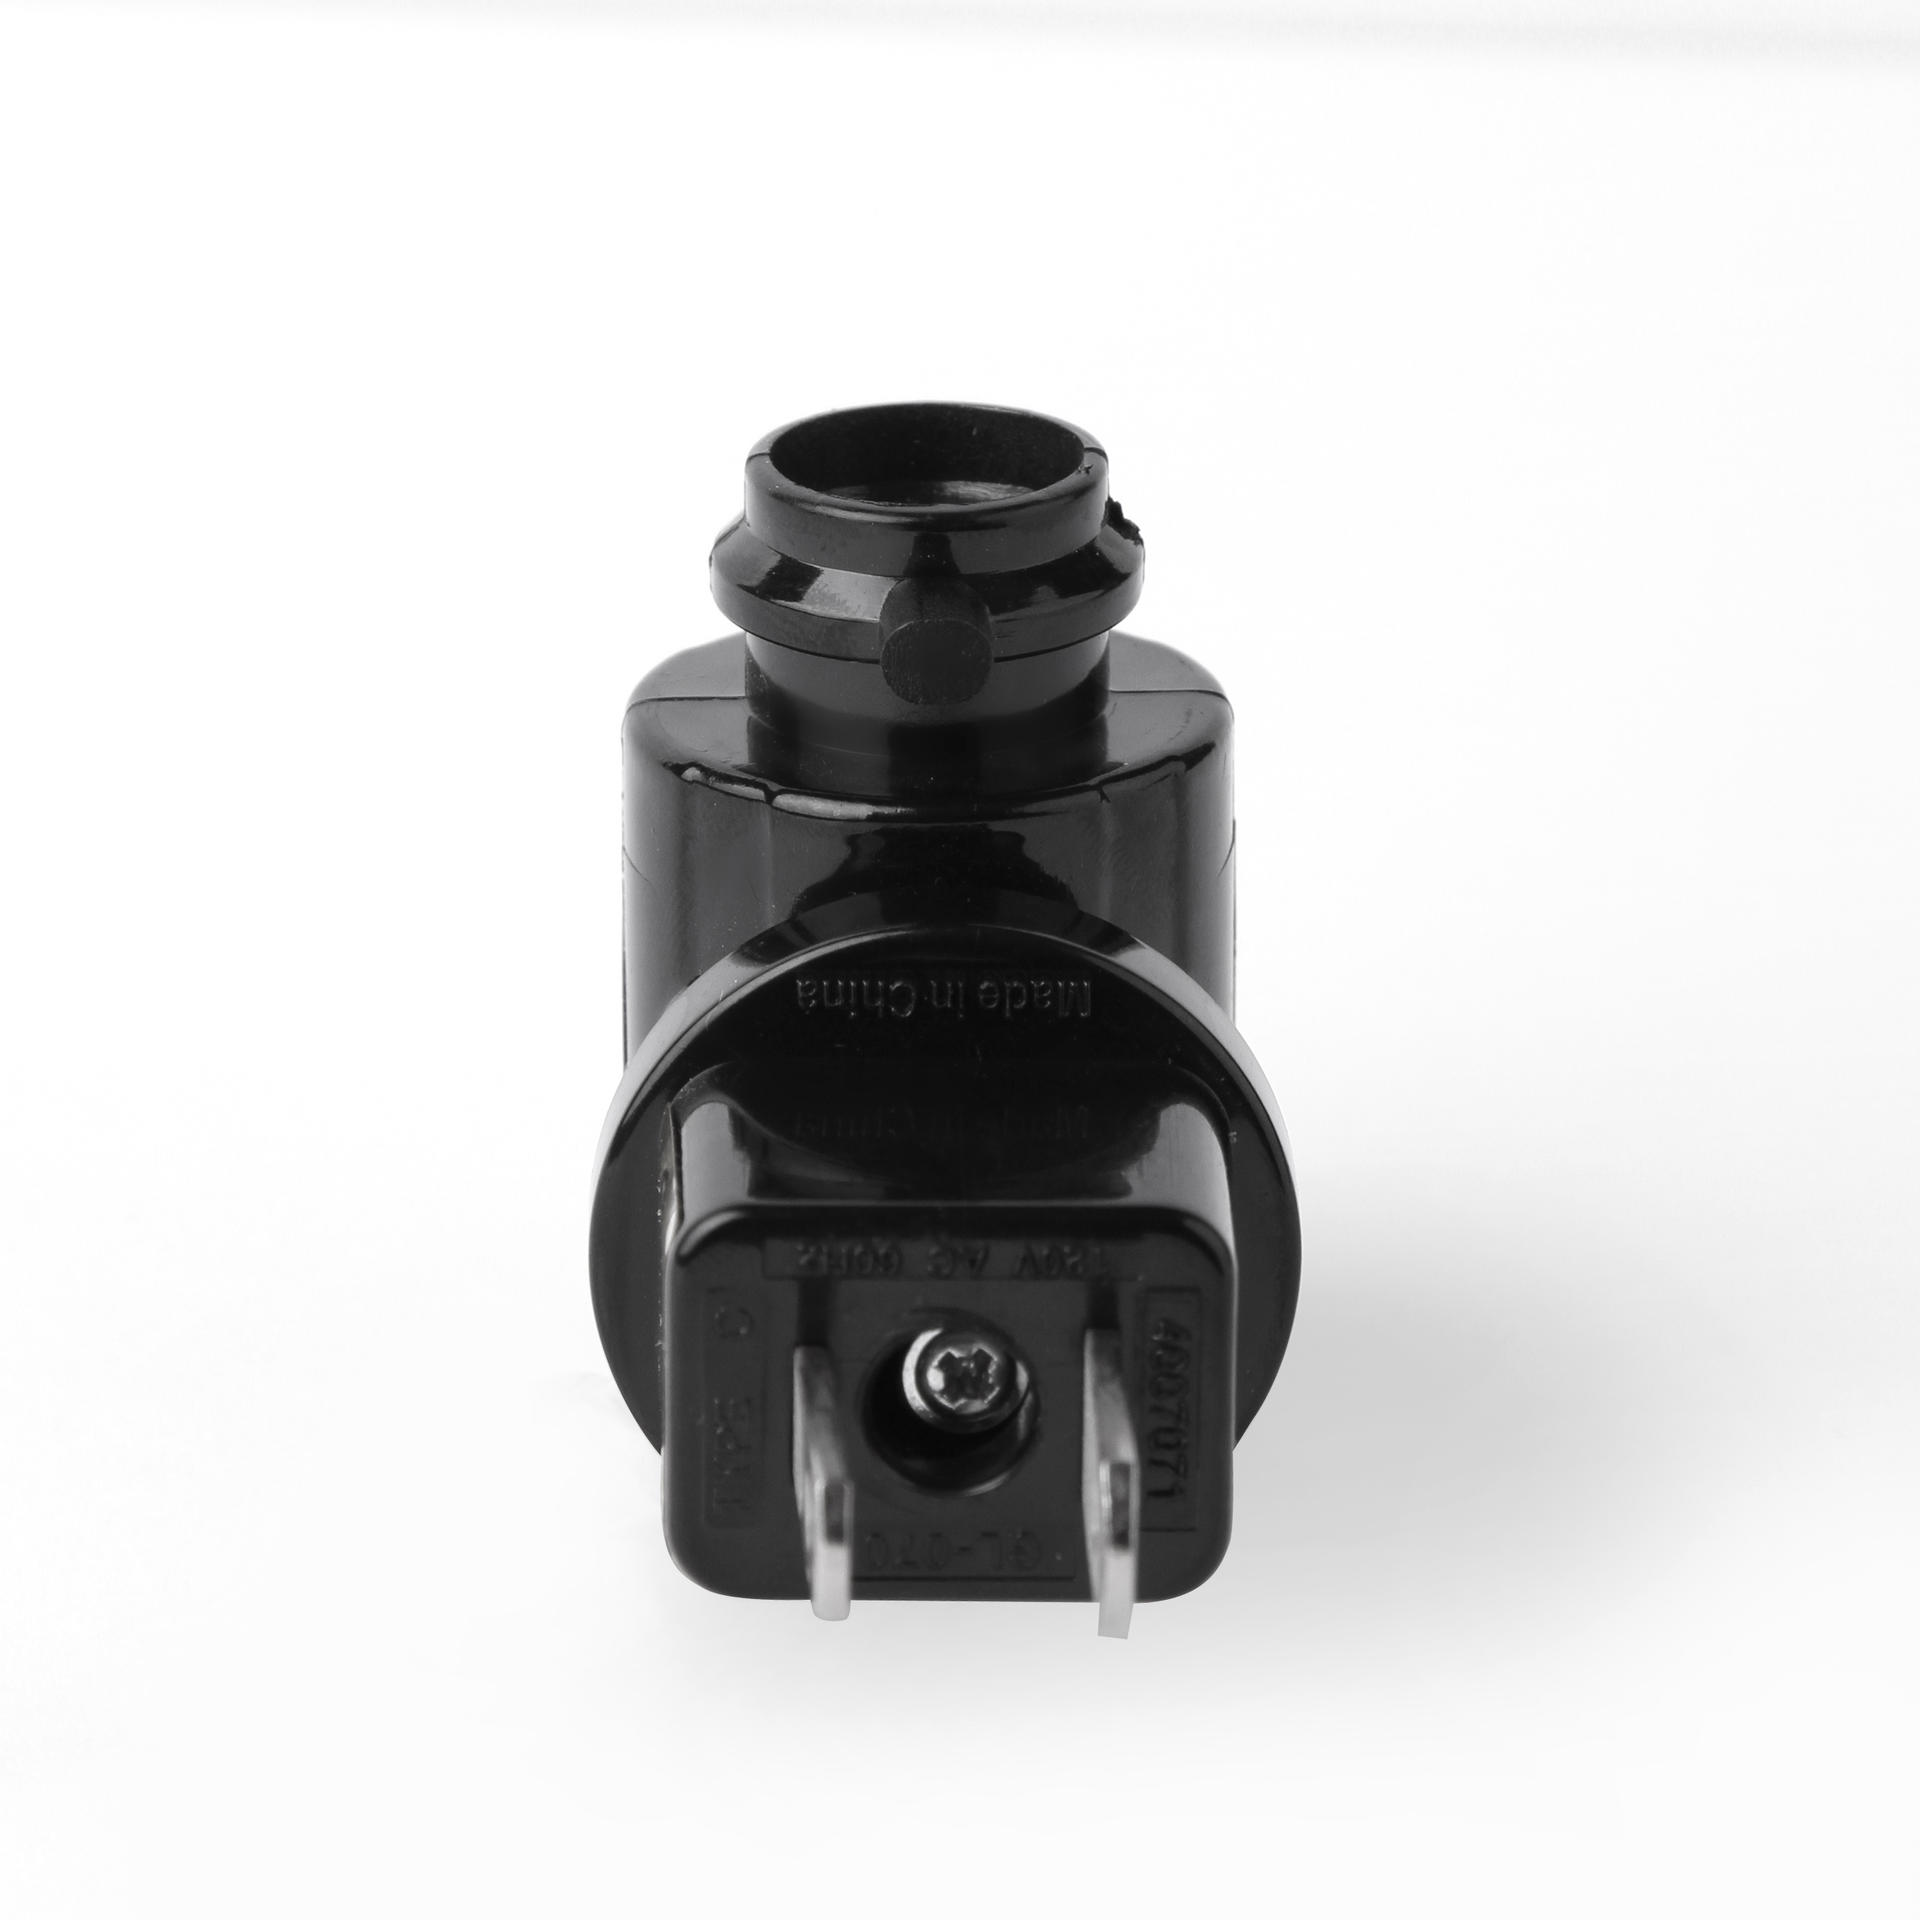 ETL USA plug in lamp holder electrical socket E12 for night light black color GL-070